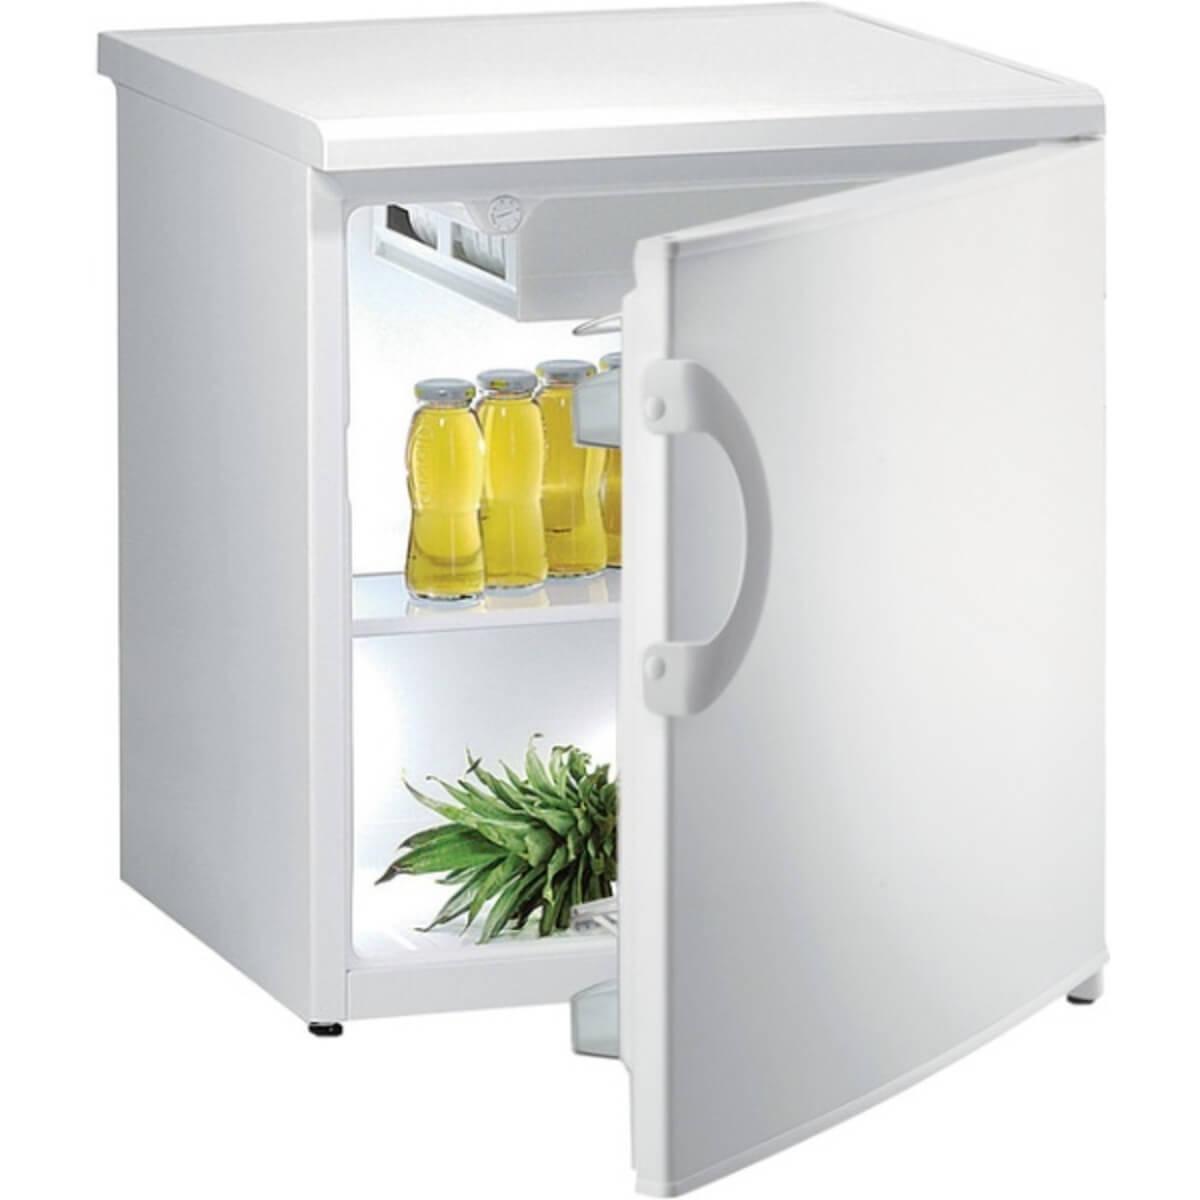 gorenje-rb4061aw-mini-koeleskab